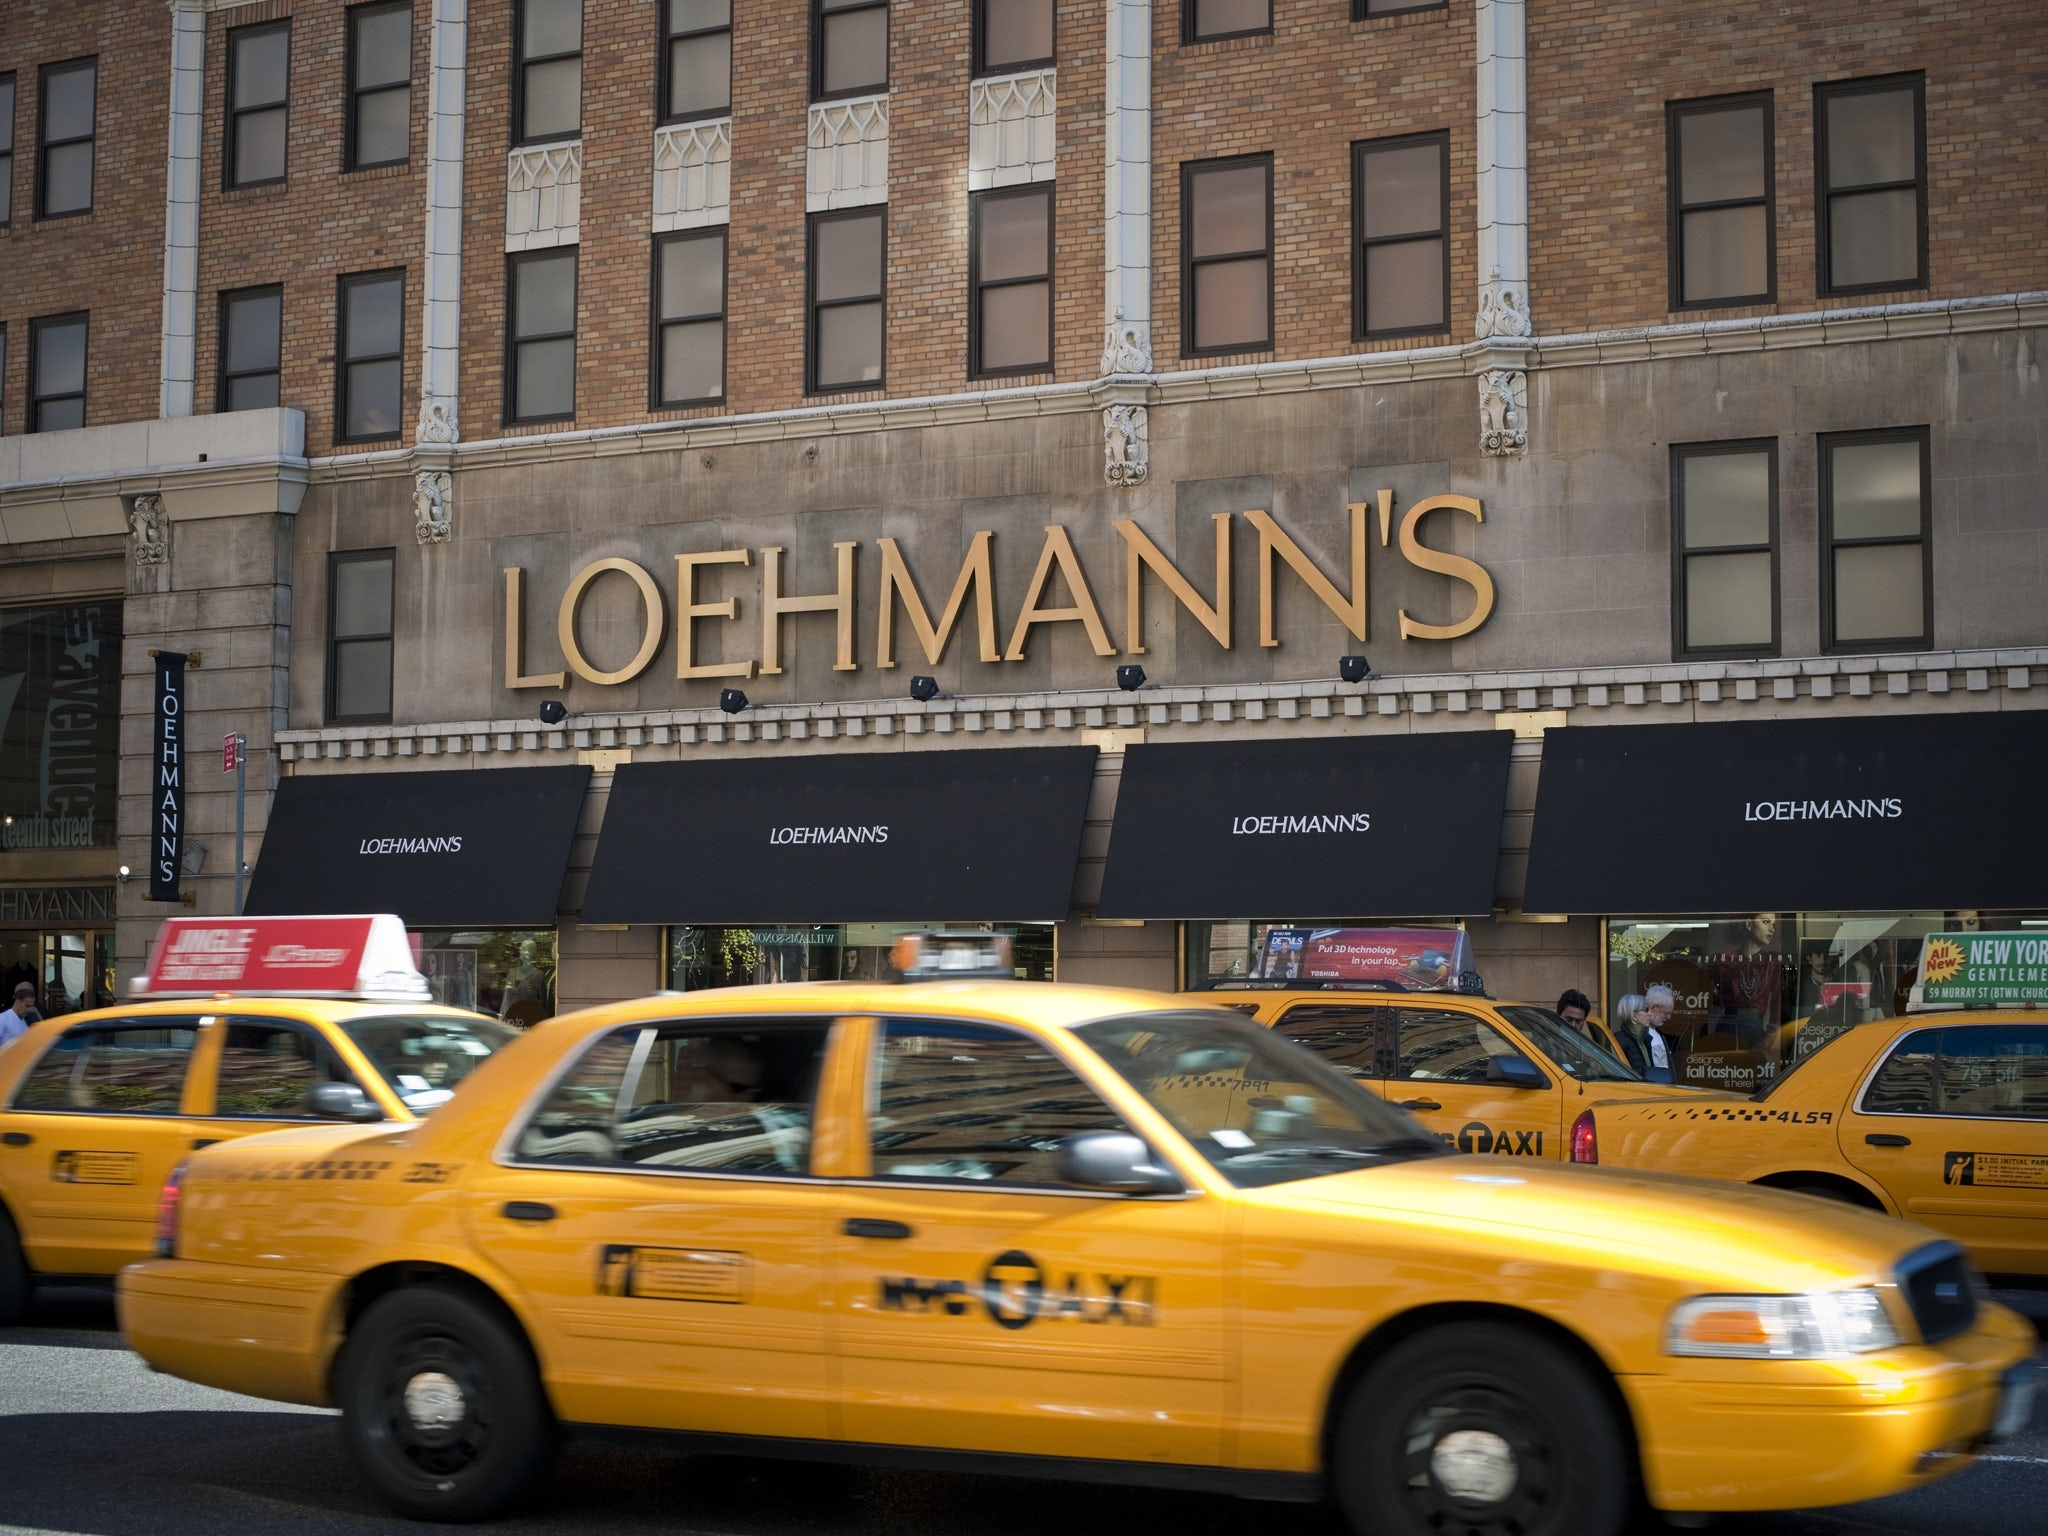 Loehmann's in New York | Source: Crain's New York Business